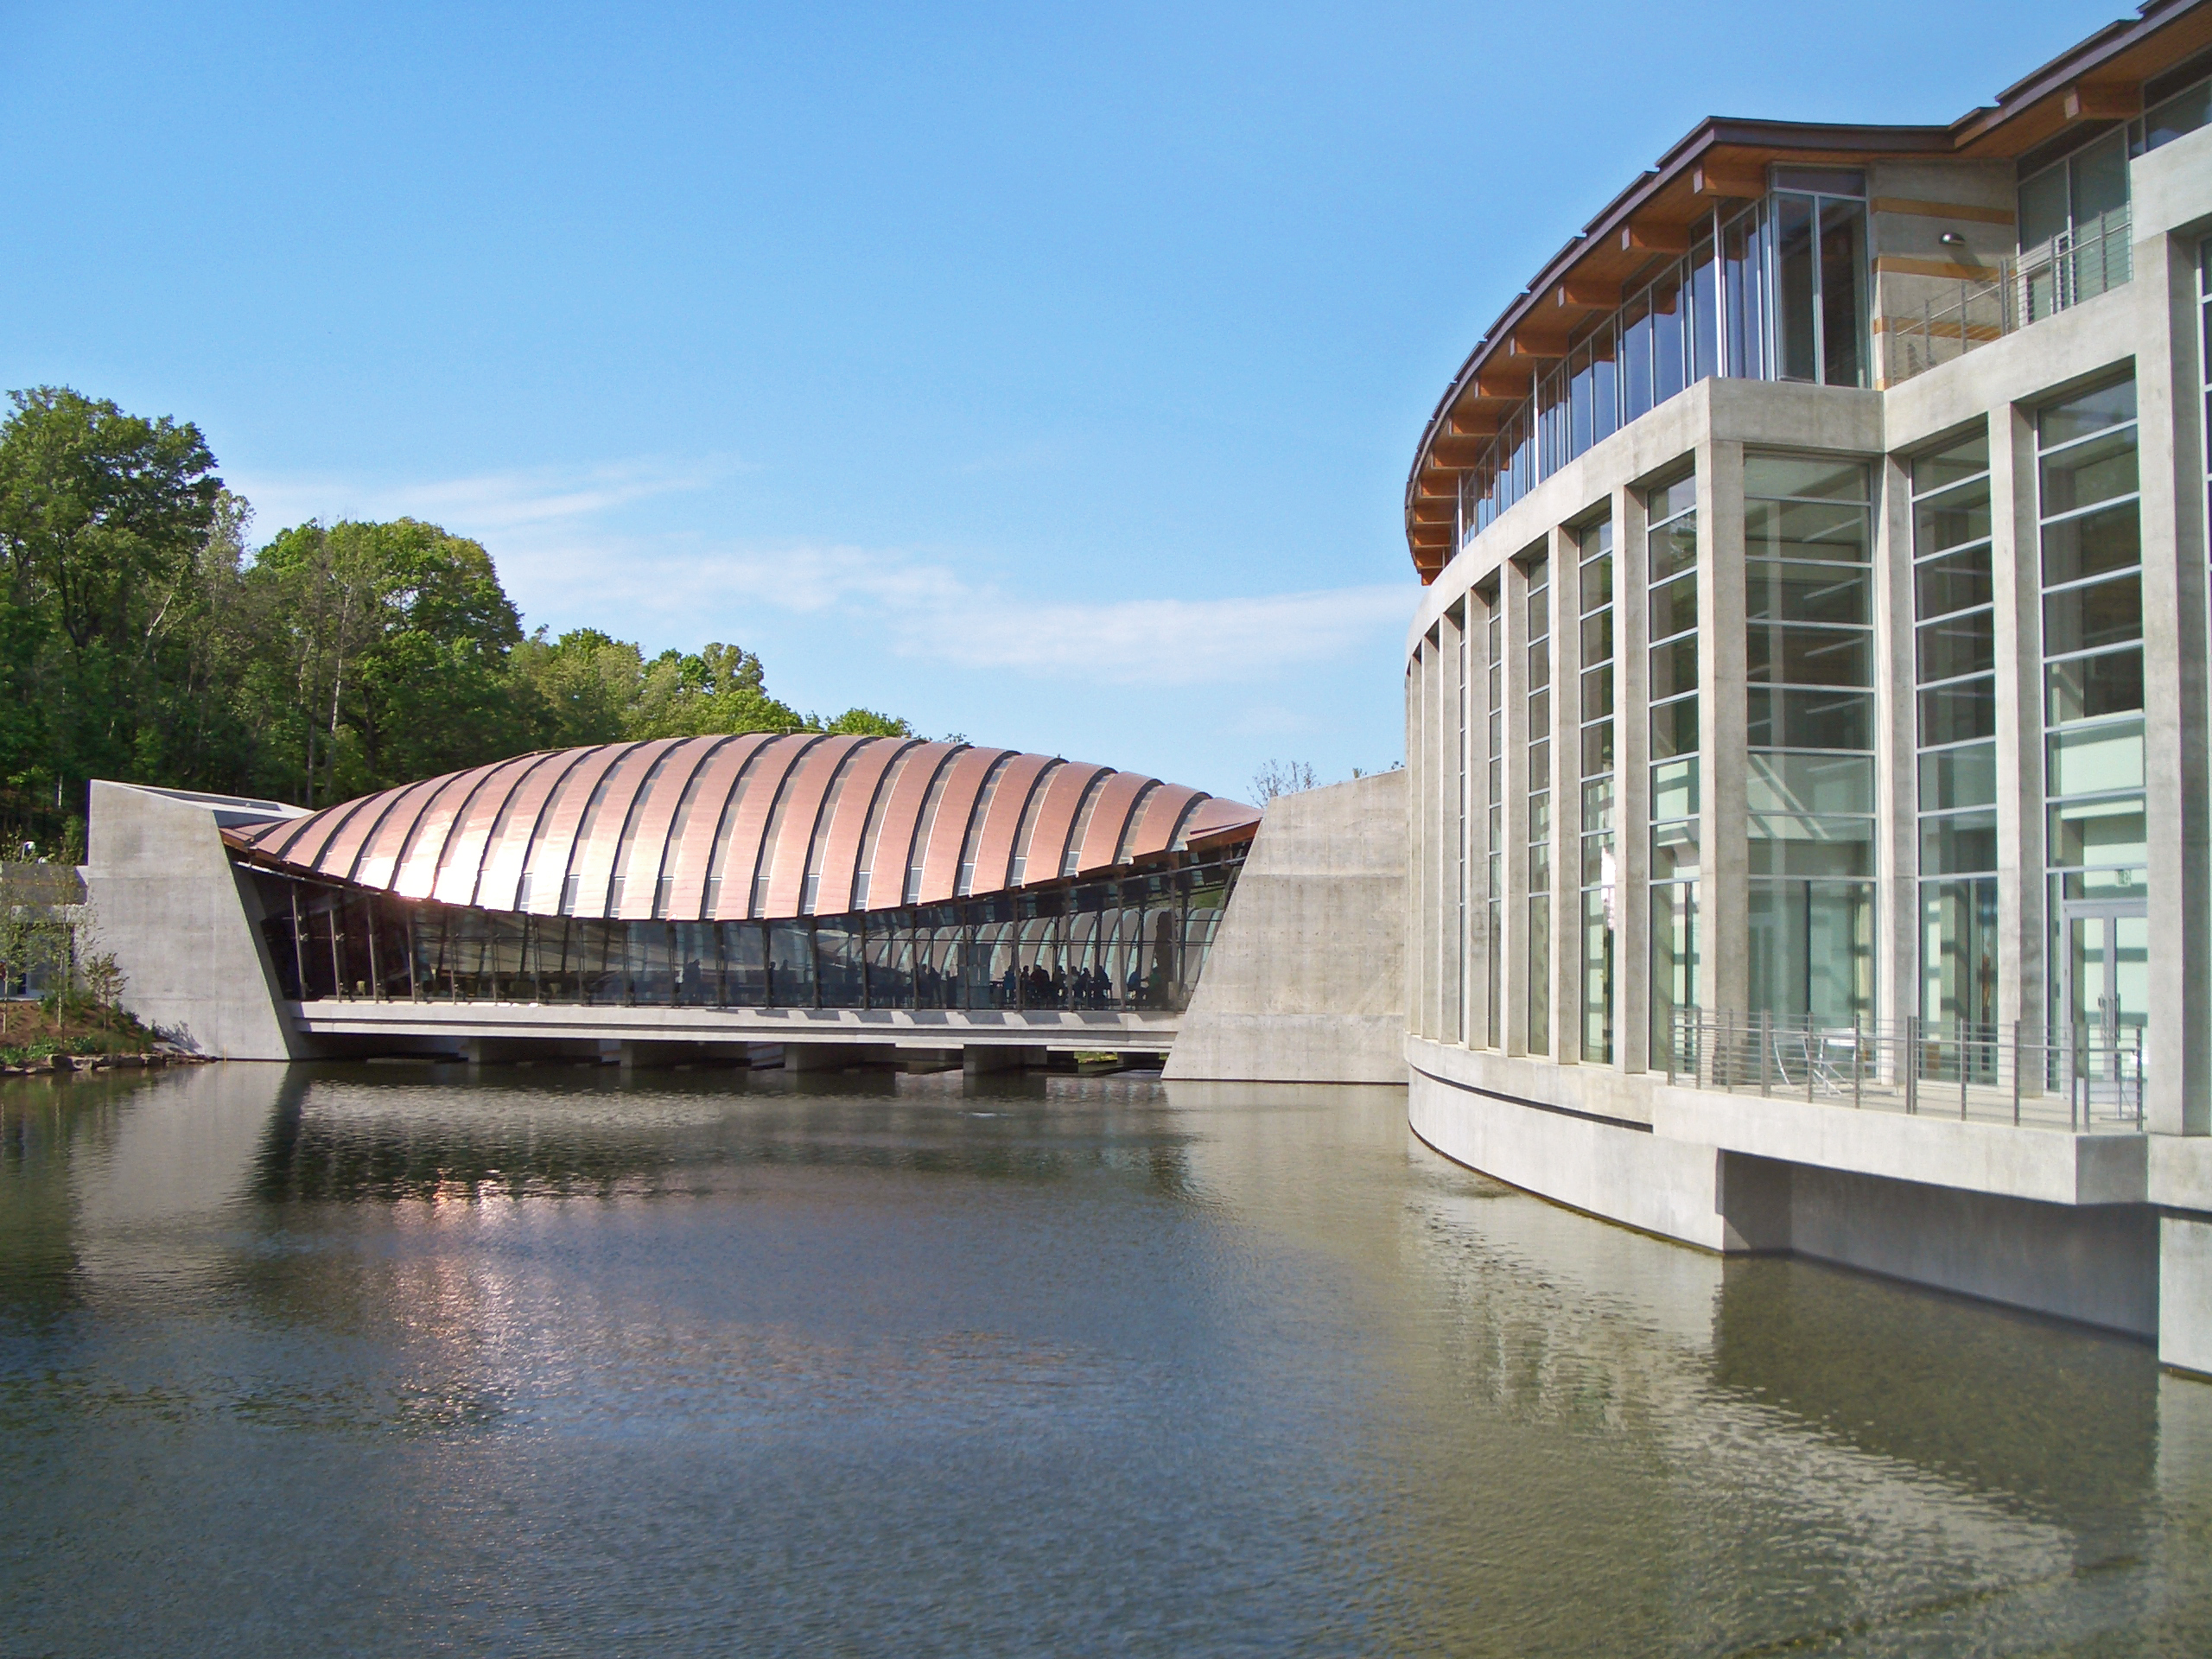 Best Place In Arkansas-Bentonville, Crystal Bridges Museum of American Art